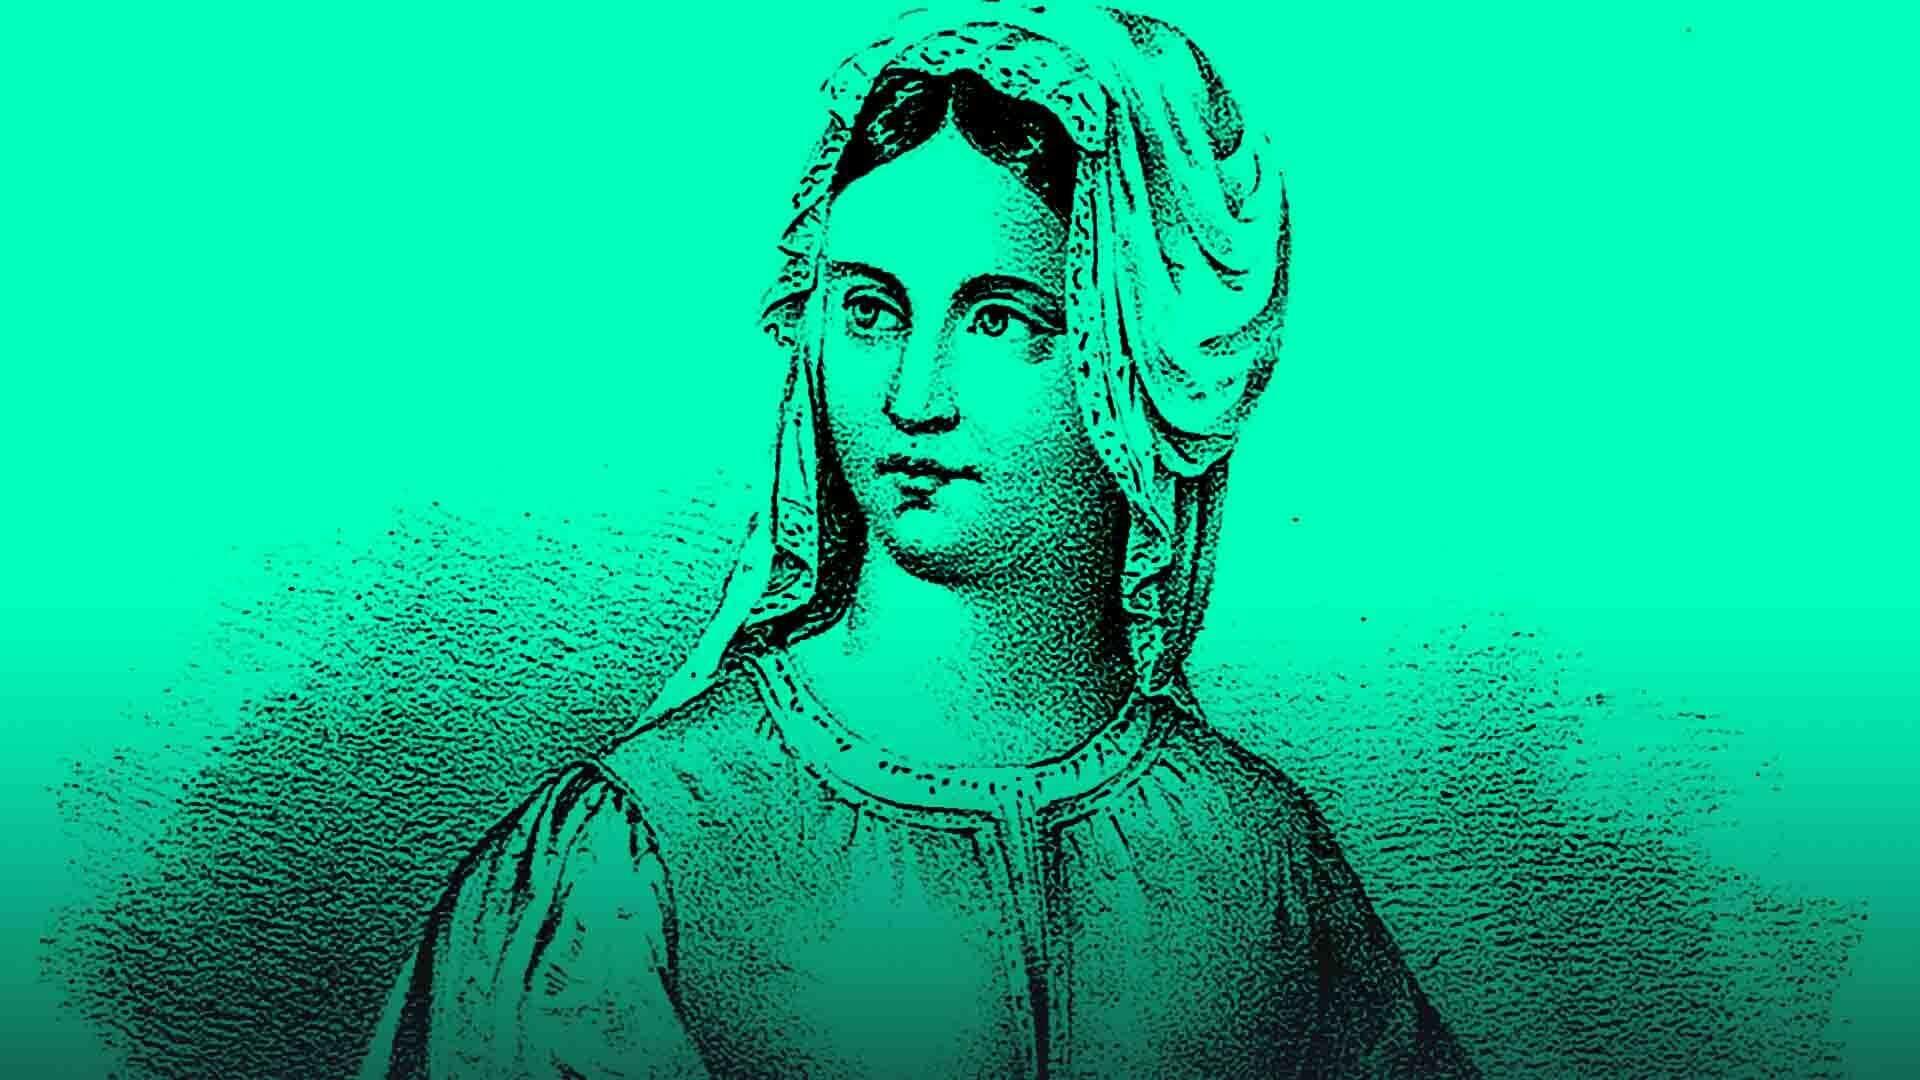 Prima donna medico d